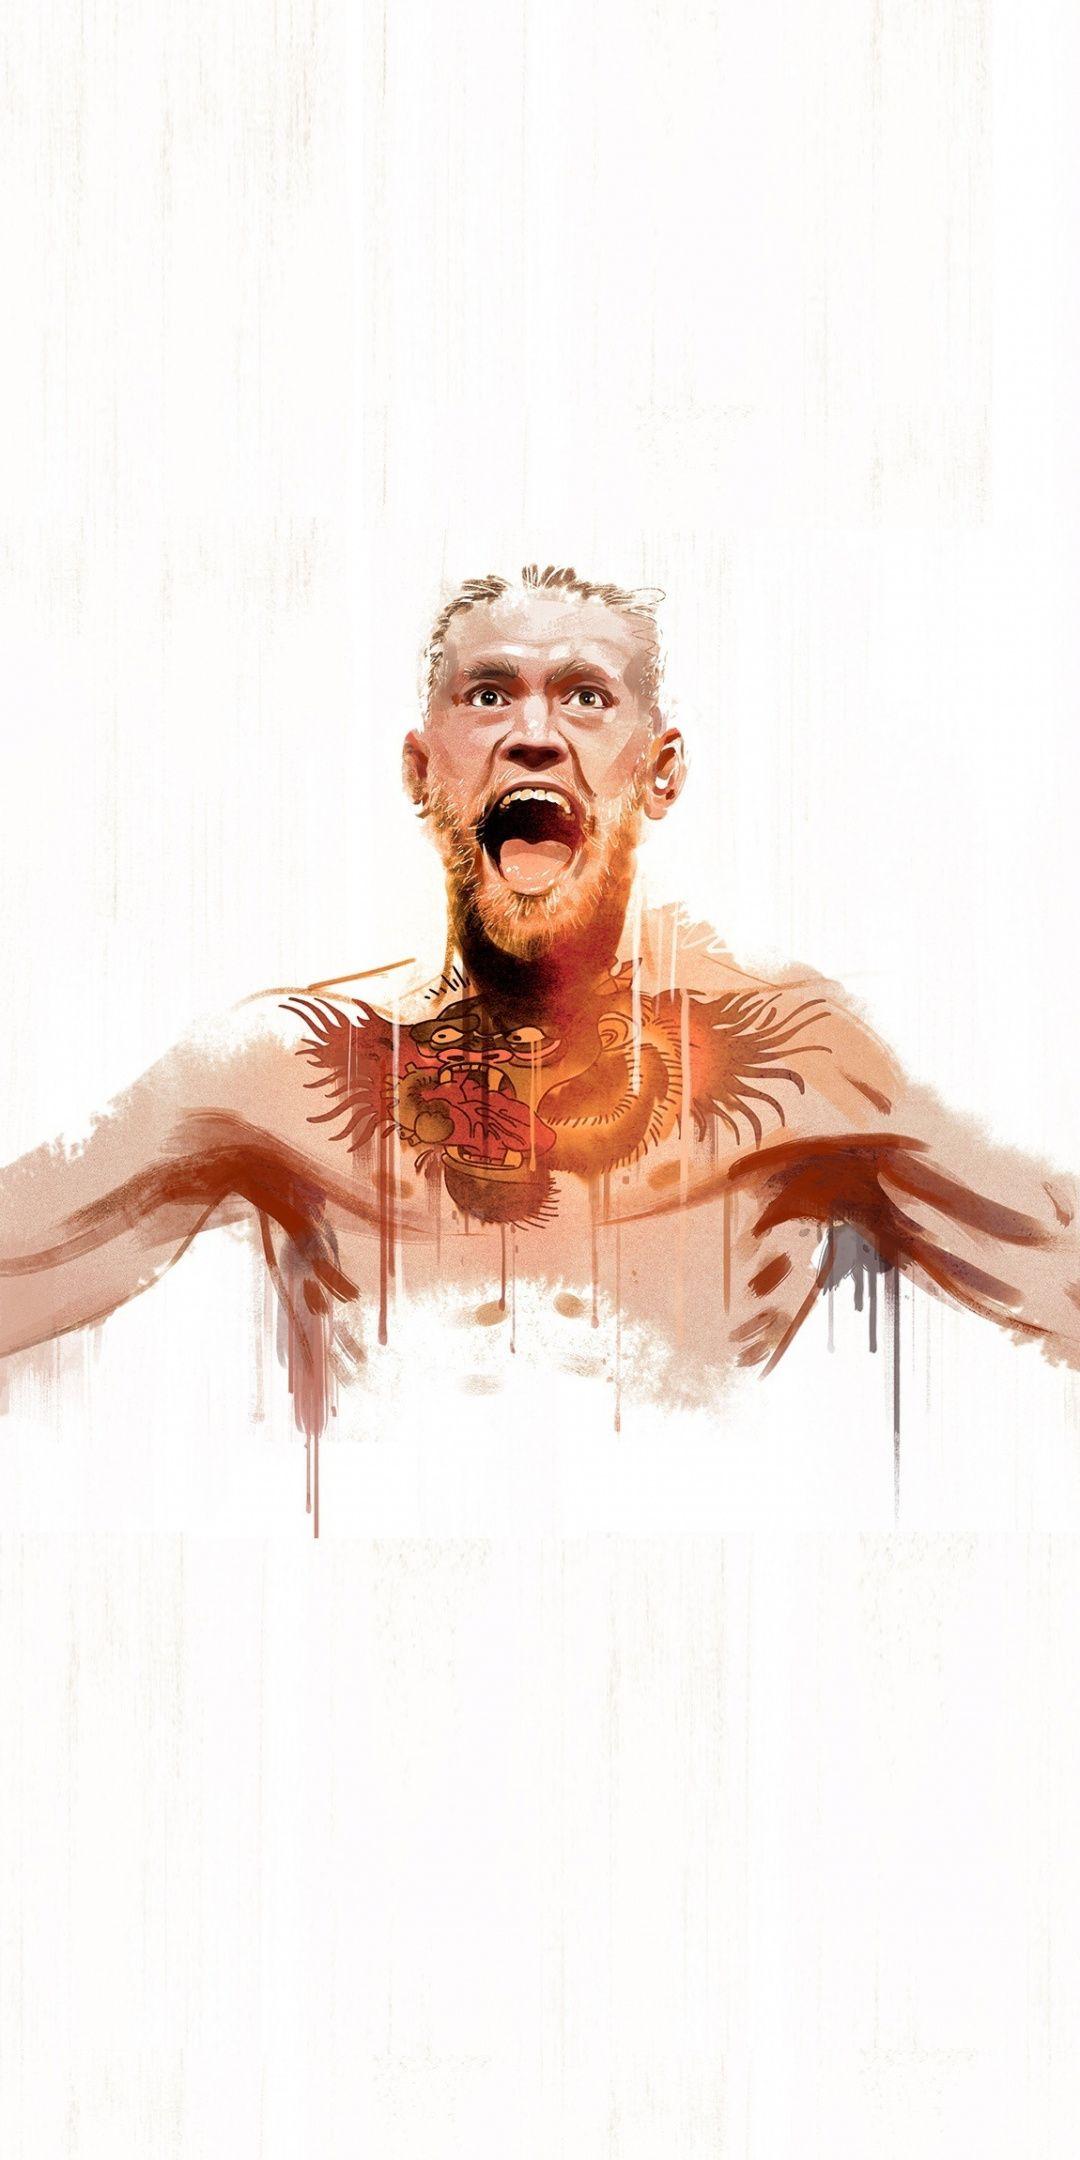 Celebrity, Conor McGregor, sports, art, 1080x2160